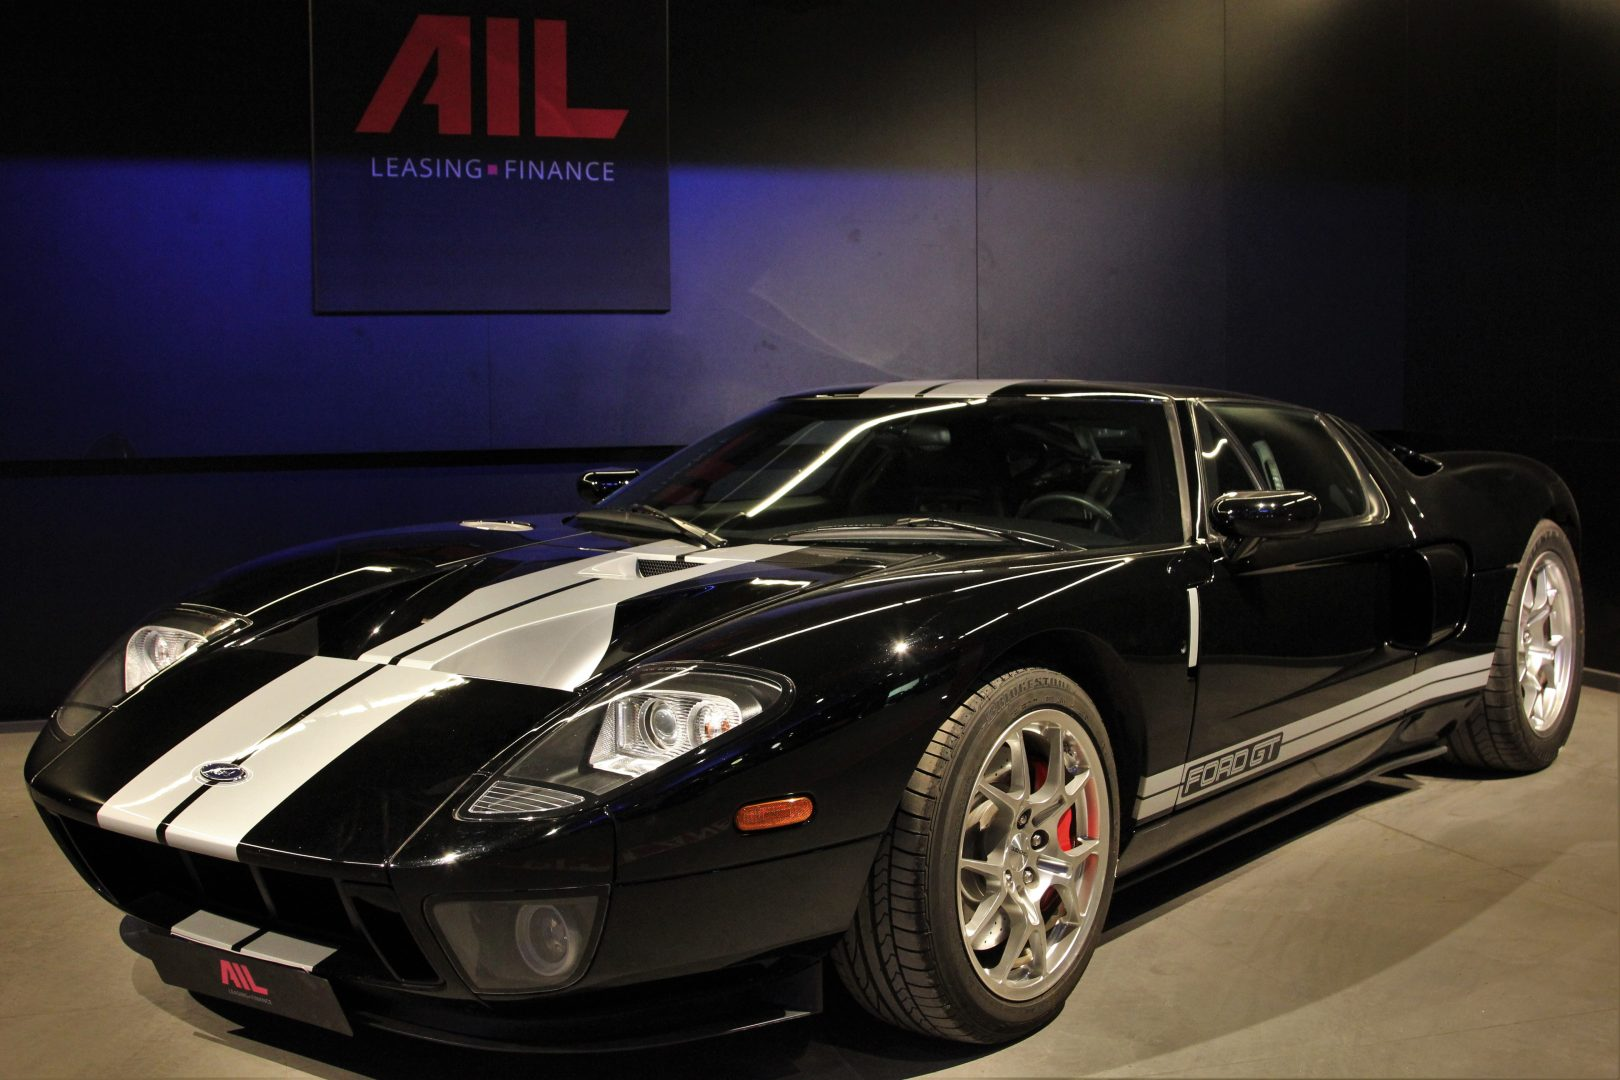 AIL Ford GT 5.4L V8 Supercharger 12